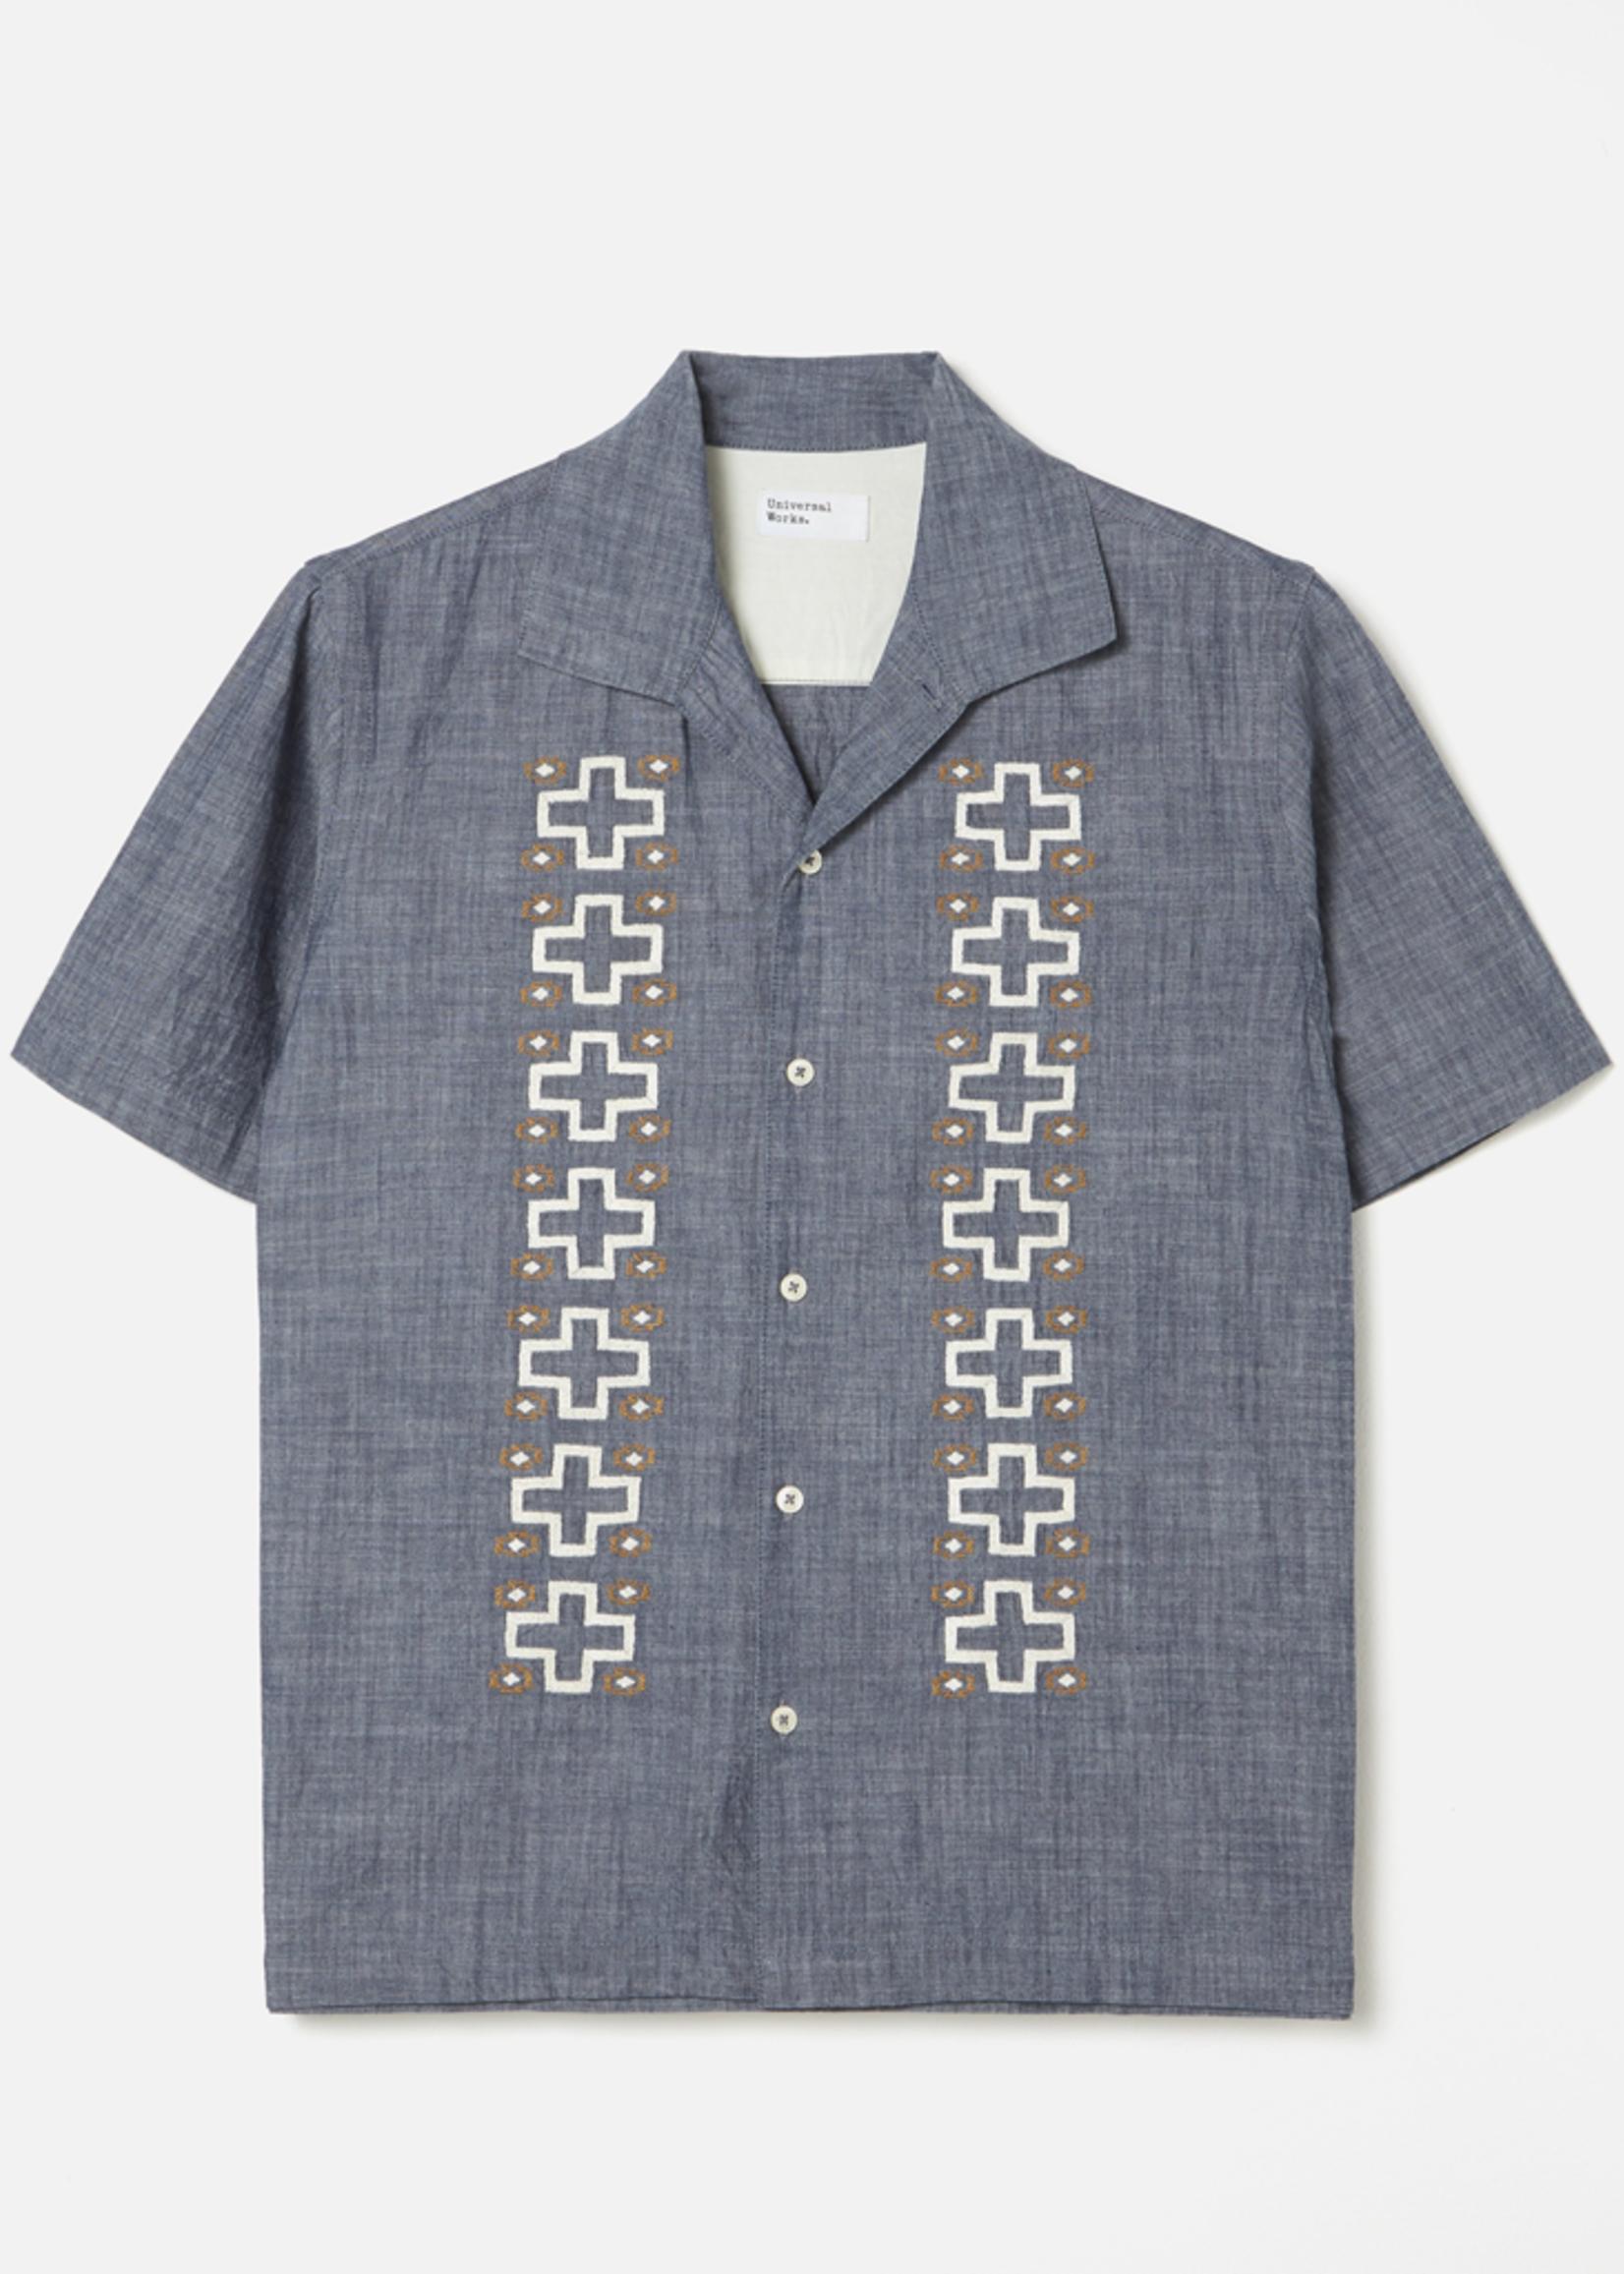 Universal Works Open Collar Indigo Chambray Shirt by Universal Works